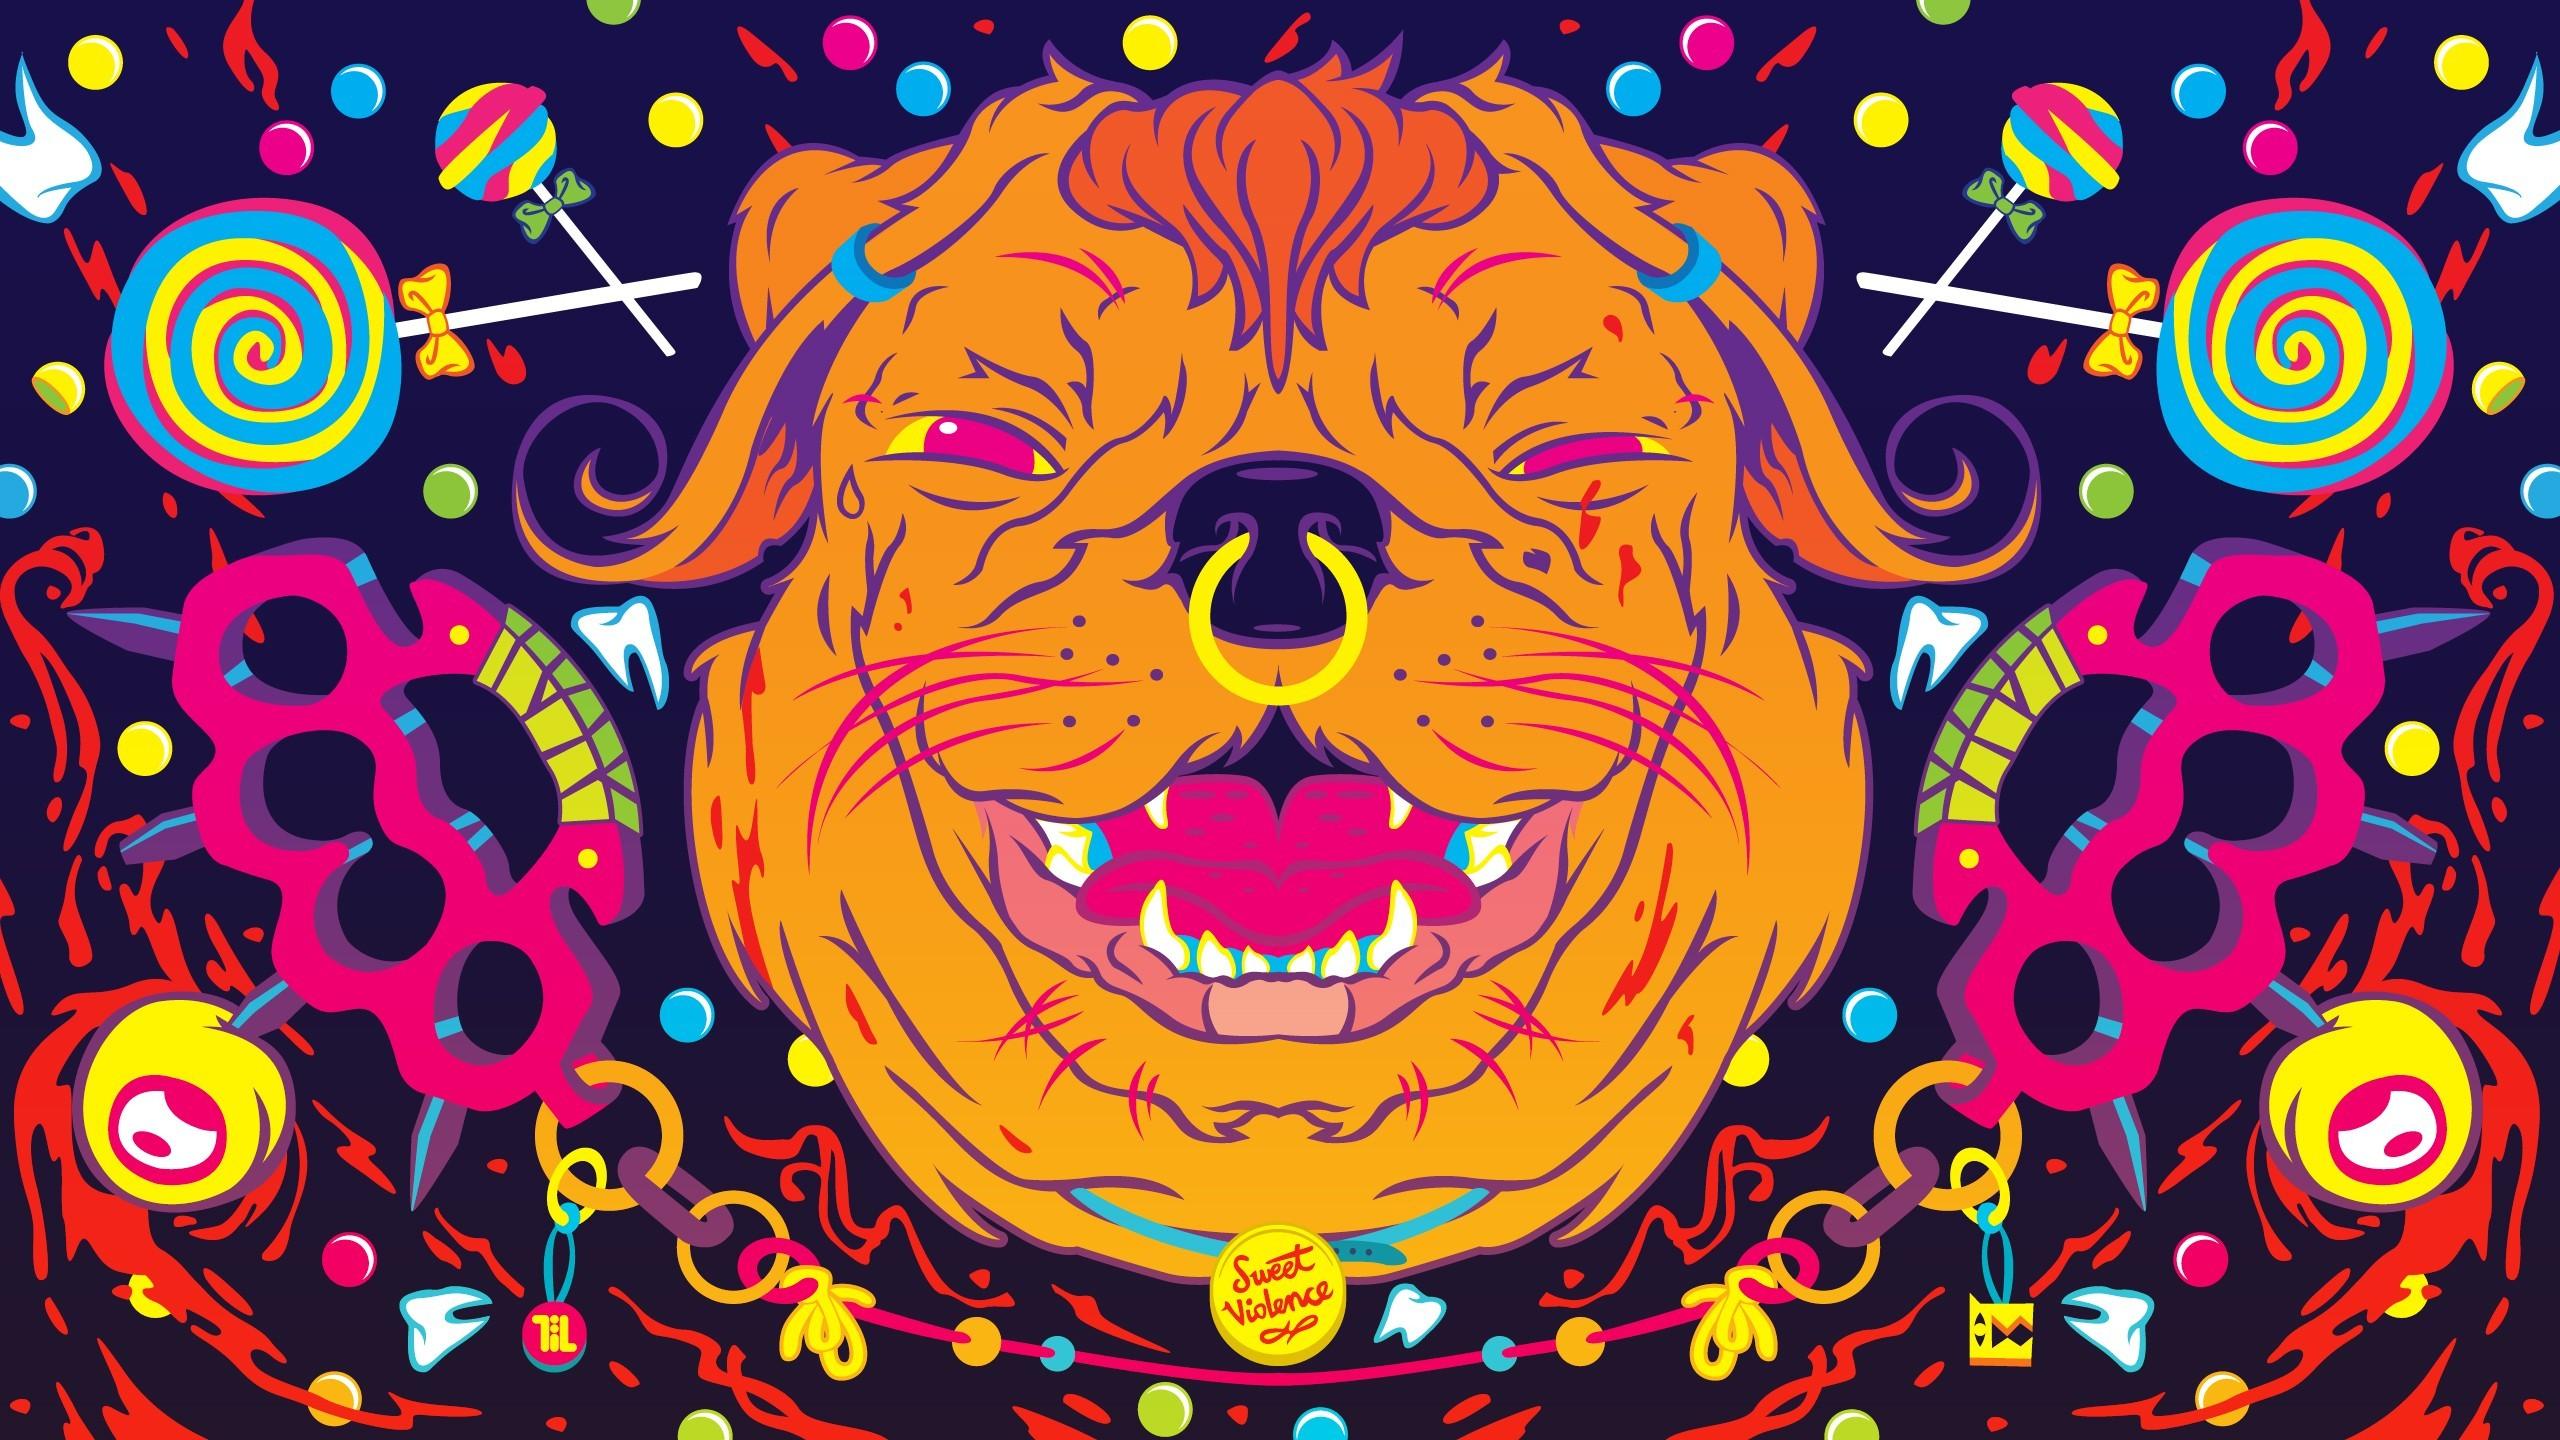 Trippy Art Wallpaper (67+ Images